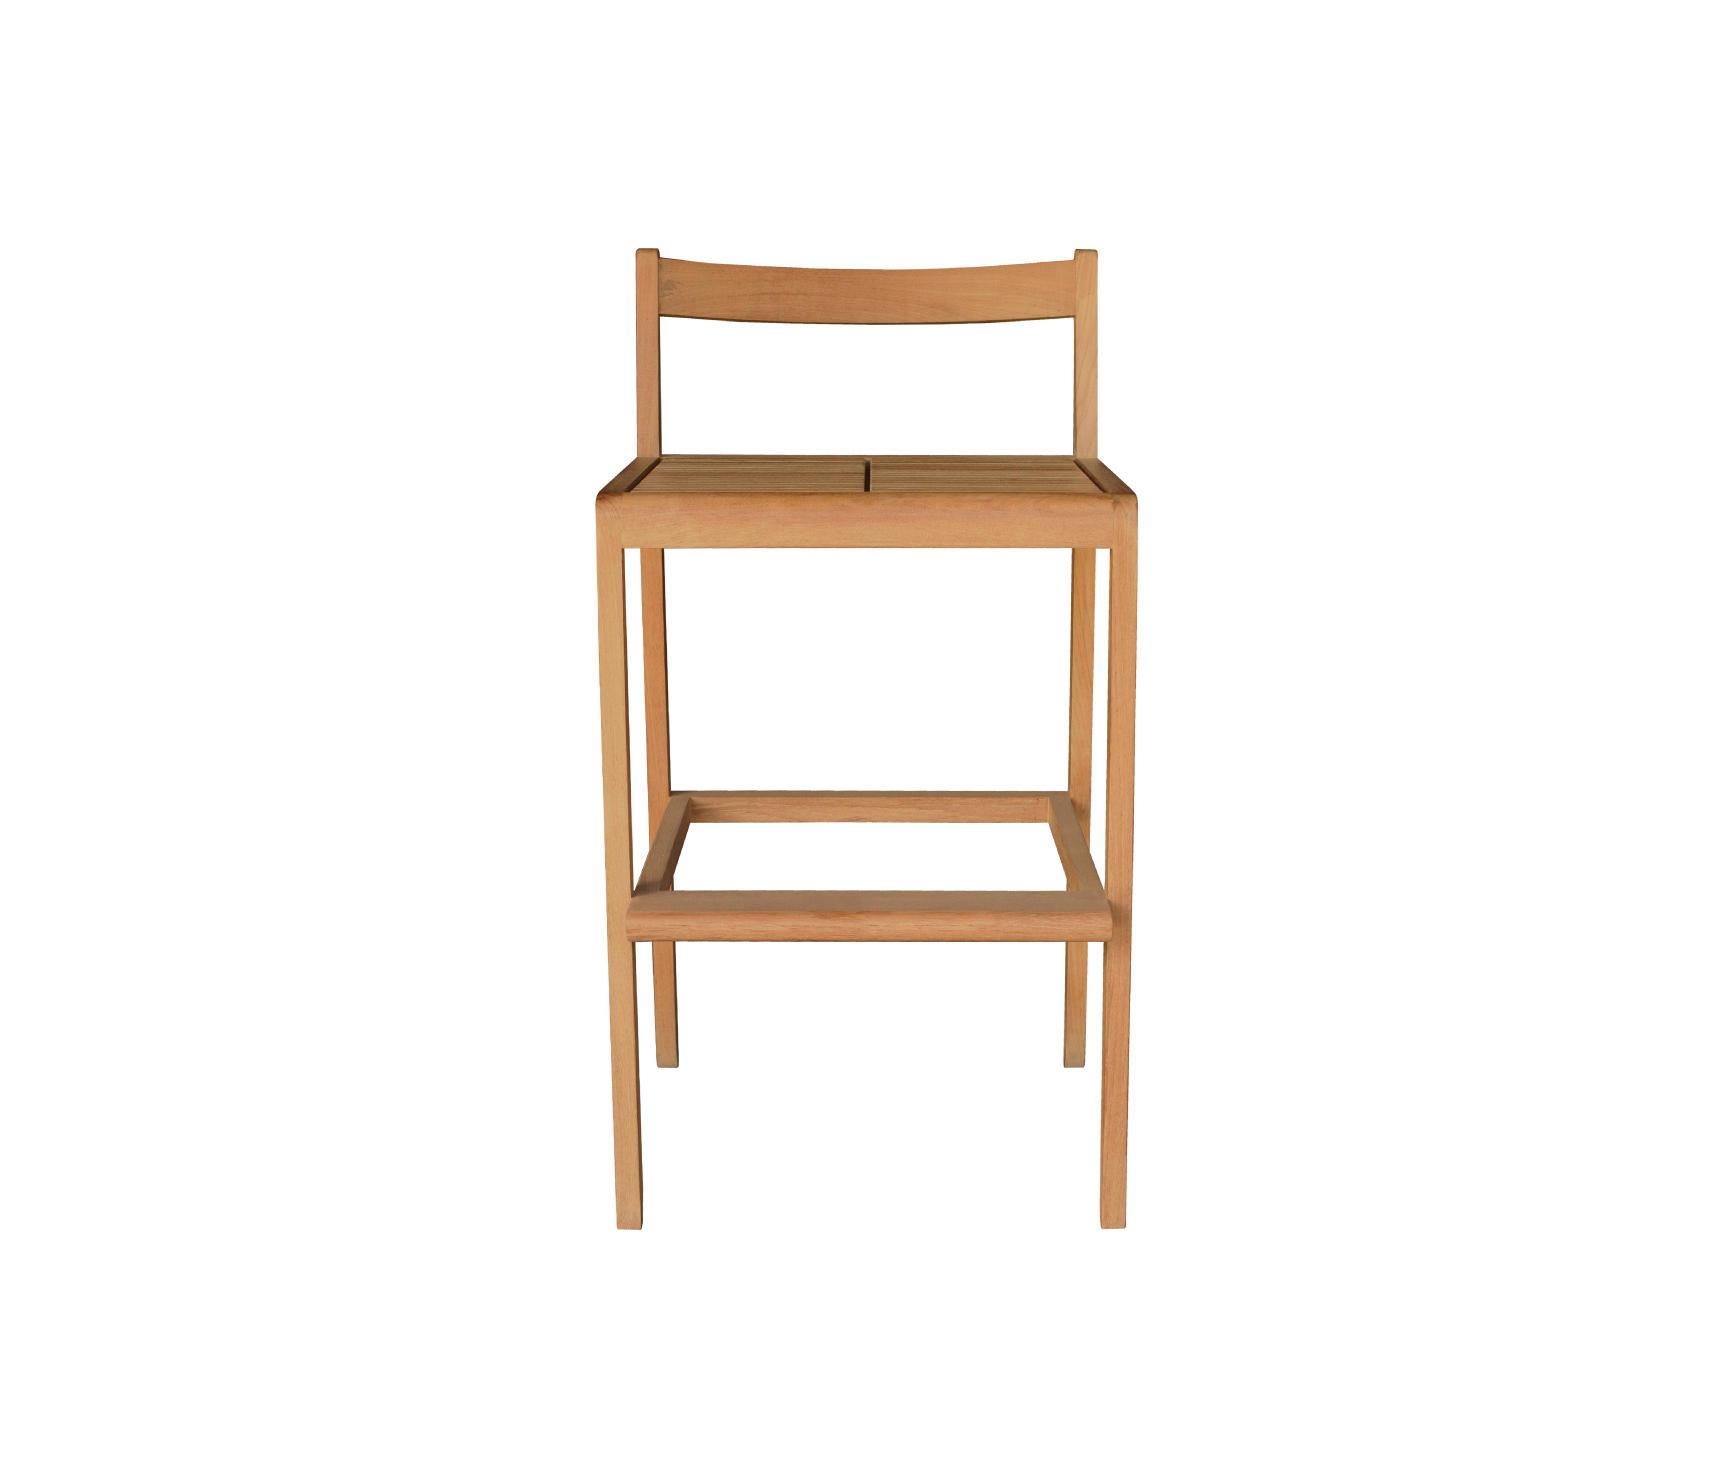 Saki bar stool garten barhocker von deesawat architonic for Barhocker garten